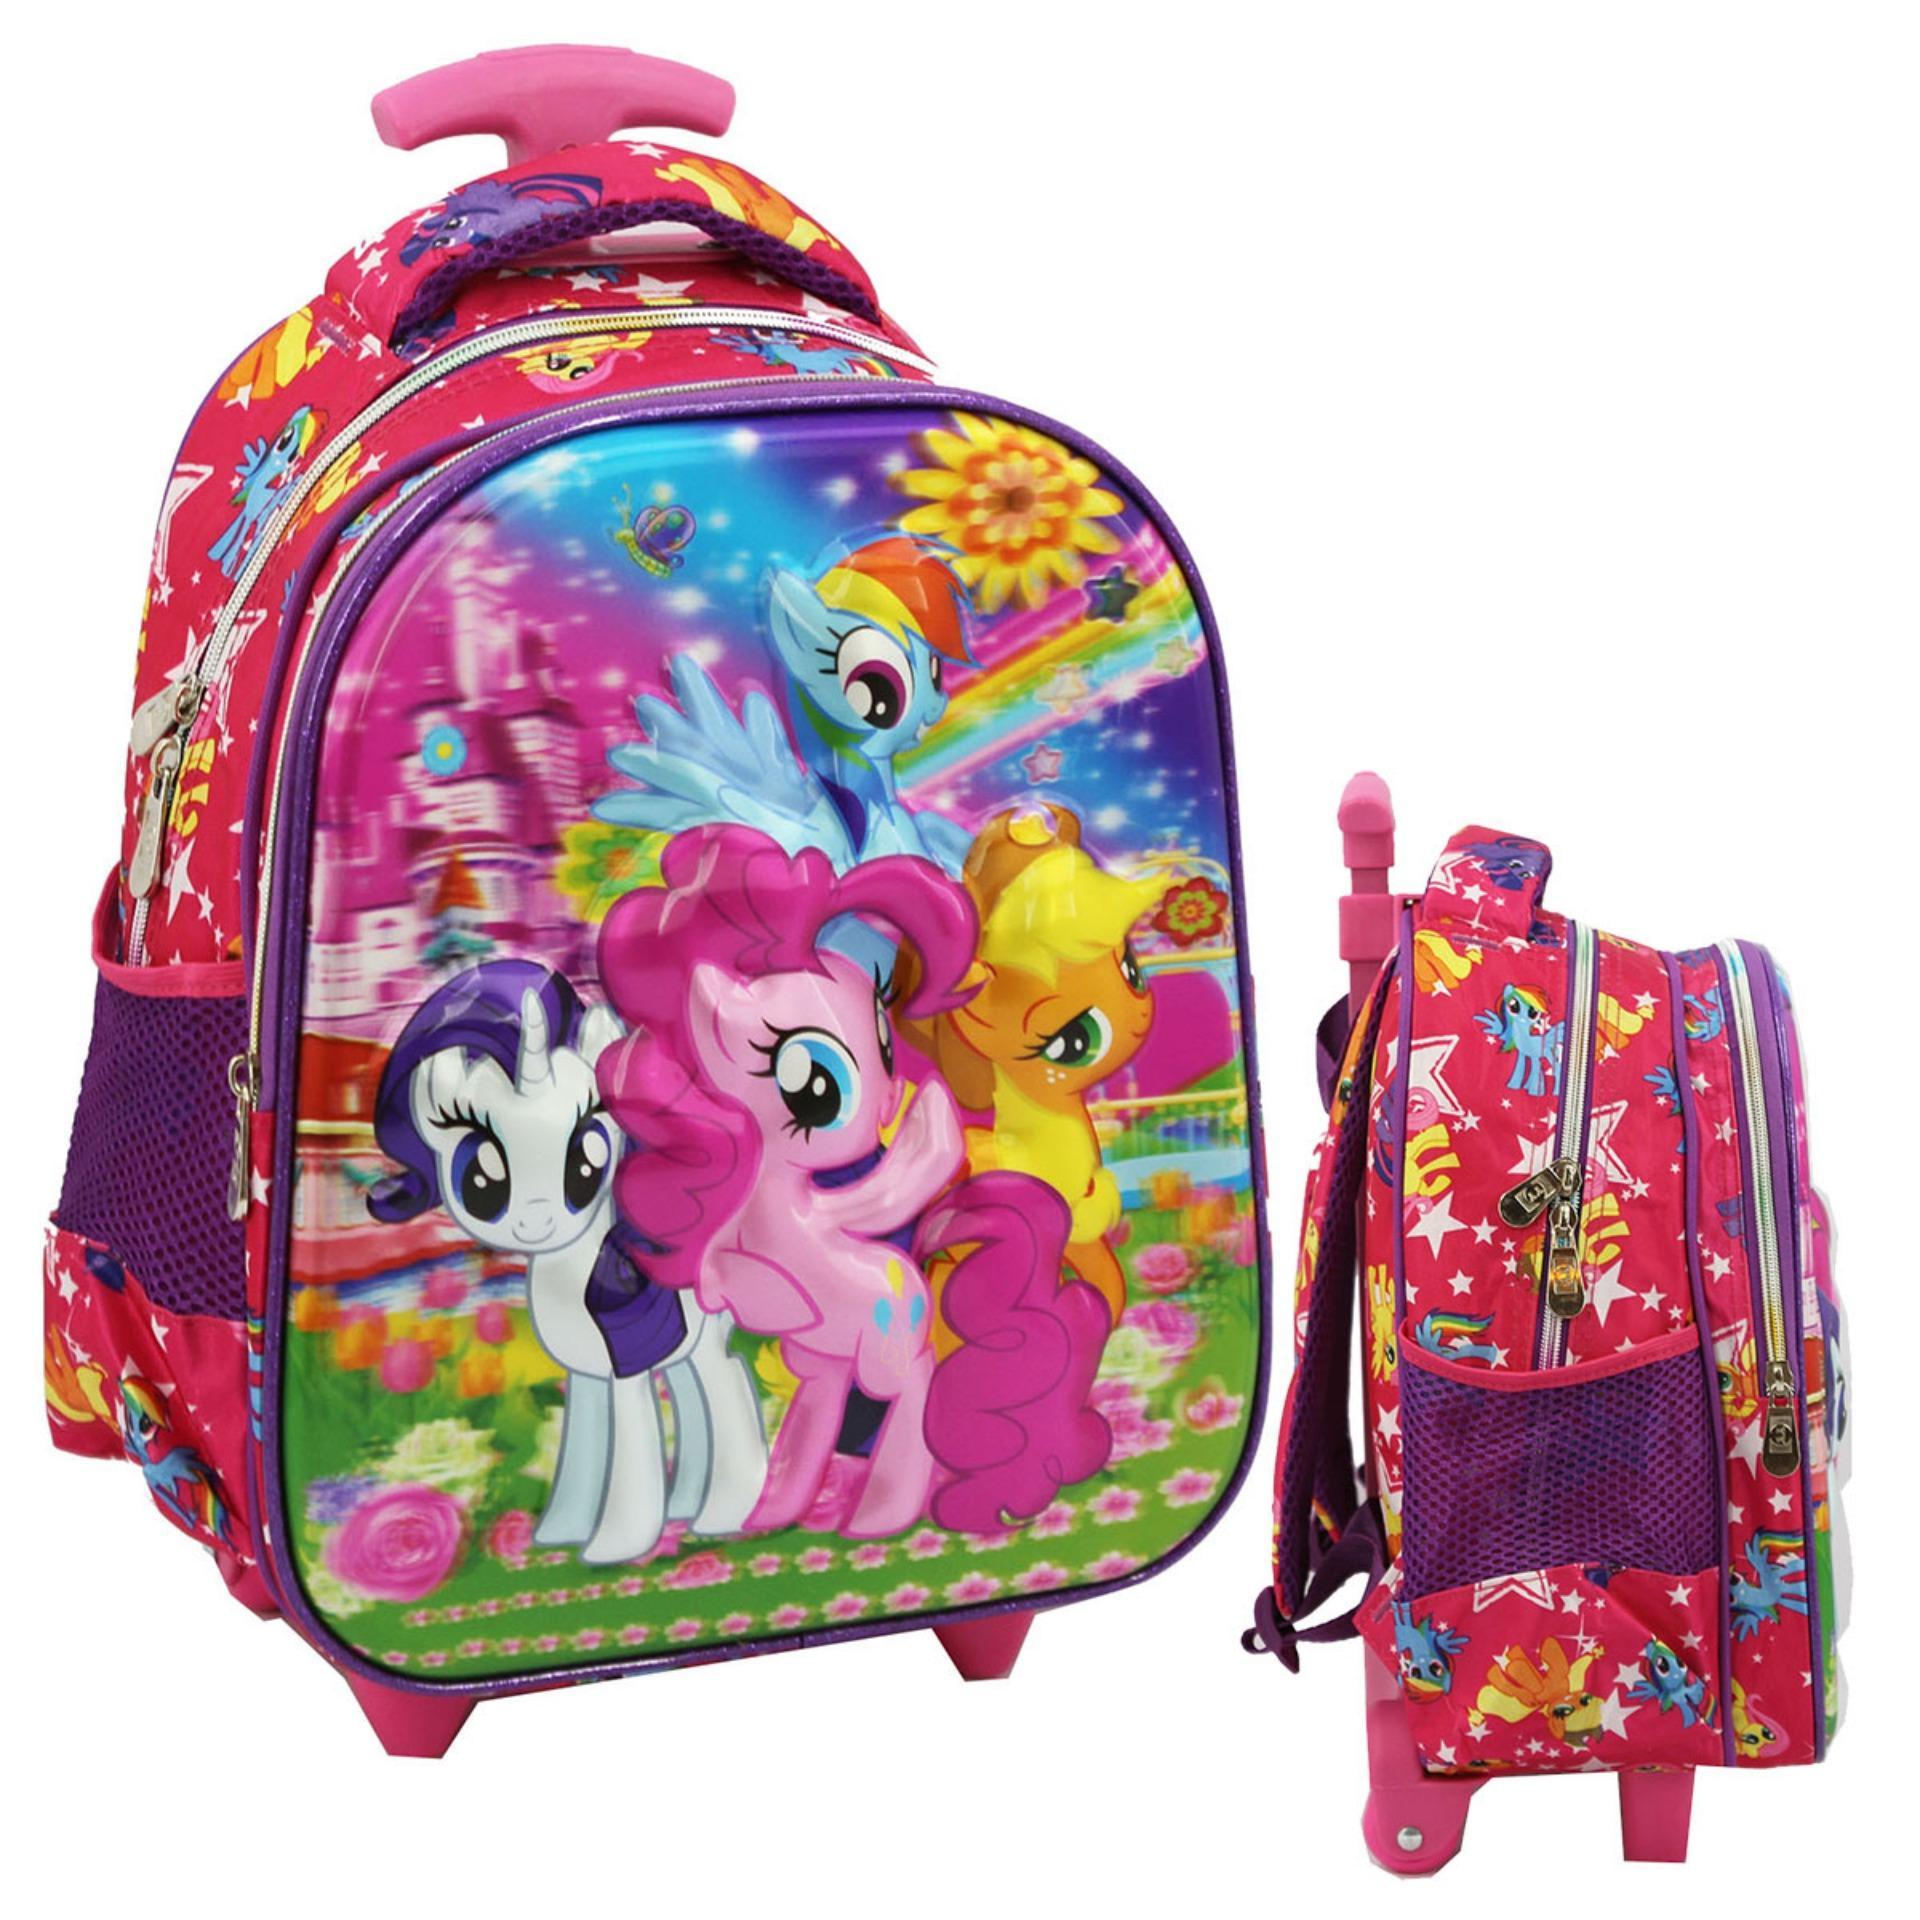 Review Onlan My Little Pony 5D Timbul Hologram Trolley Anak Sekolah Tk Ungu Onlan Di Dki Jakarta